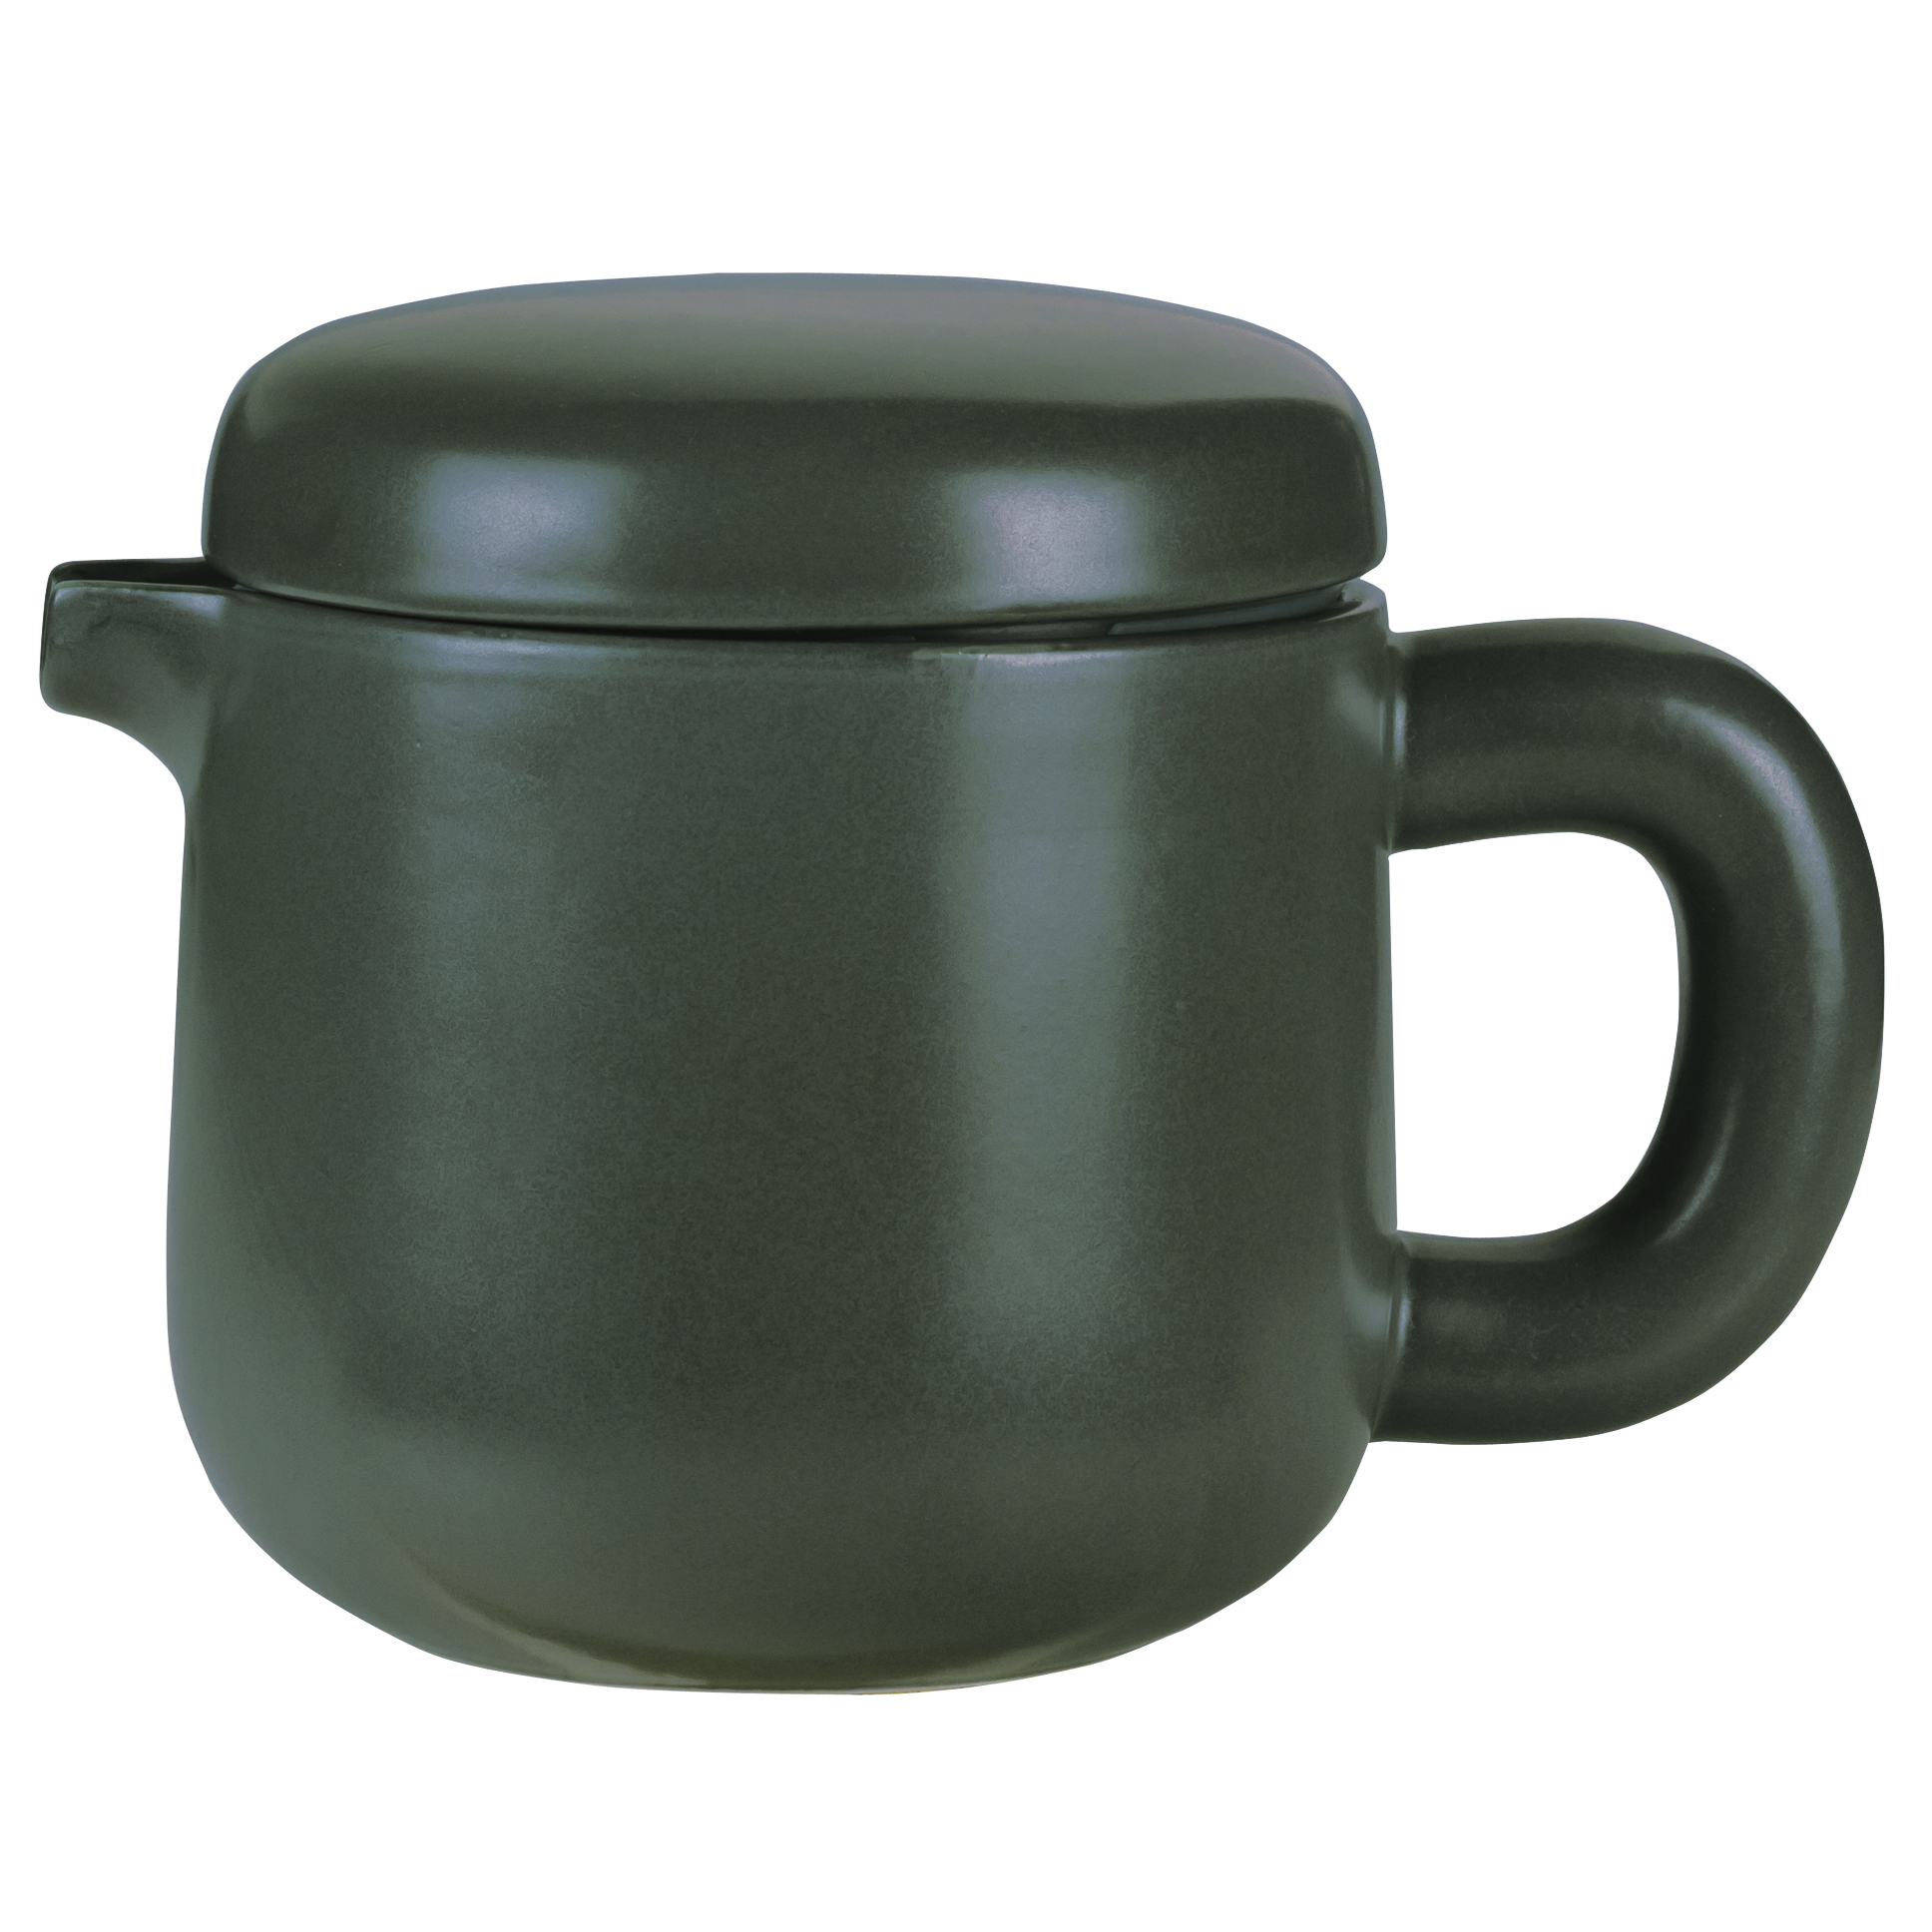 Libbey Glass VS76443 coffee pot/teapot, china